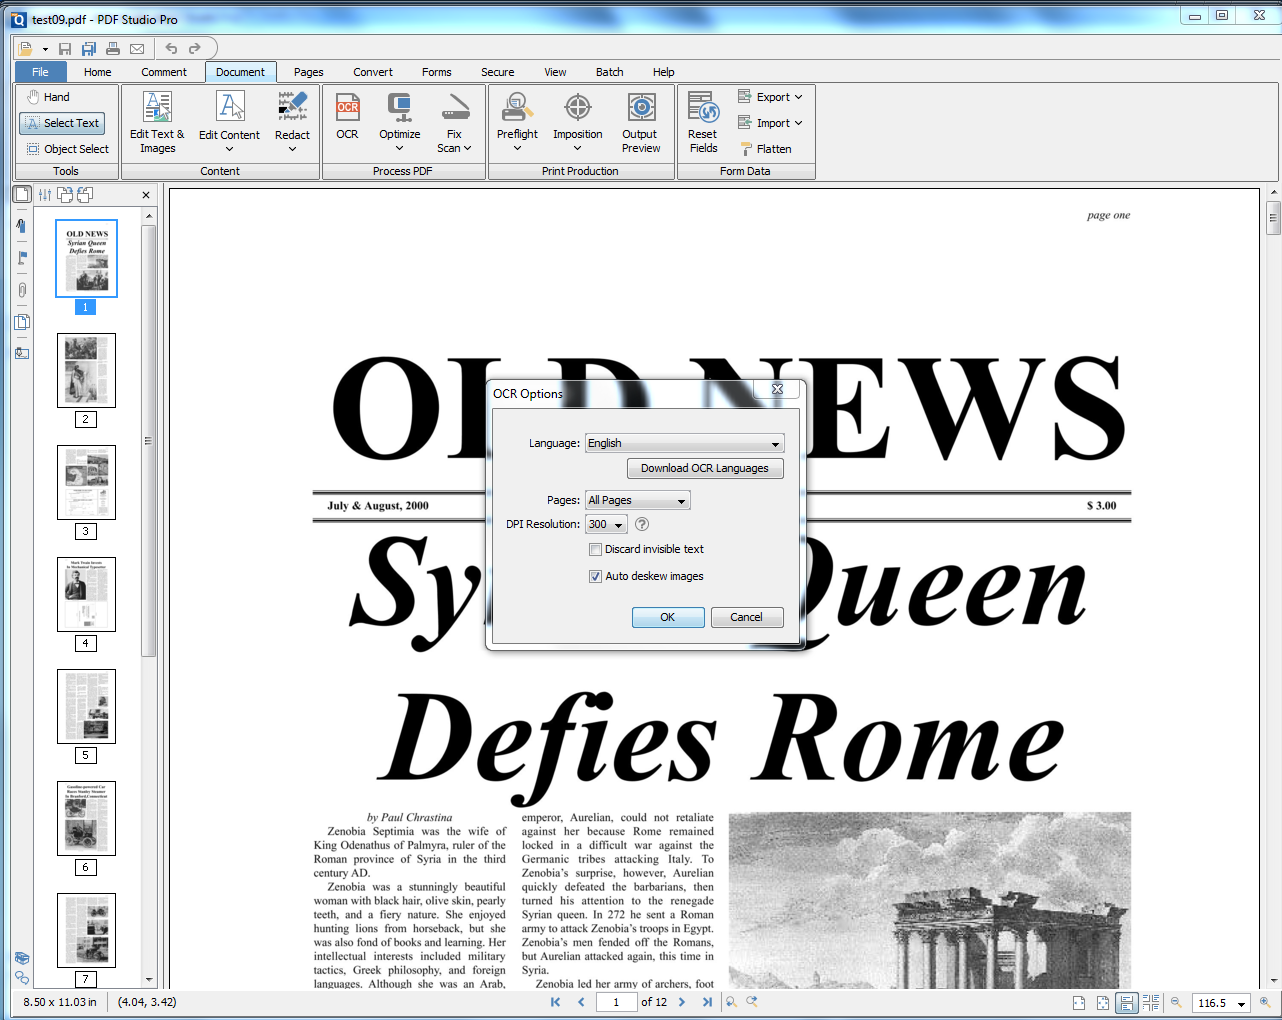 PDF Studio - OCR options